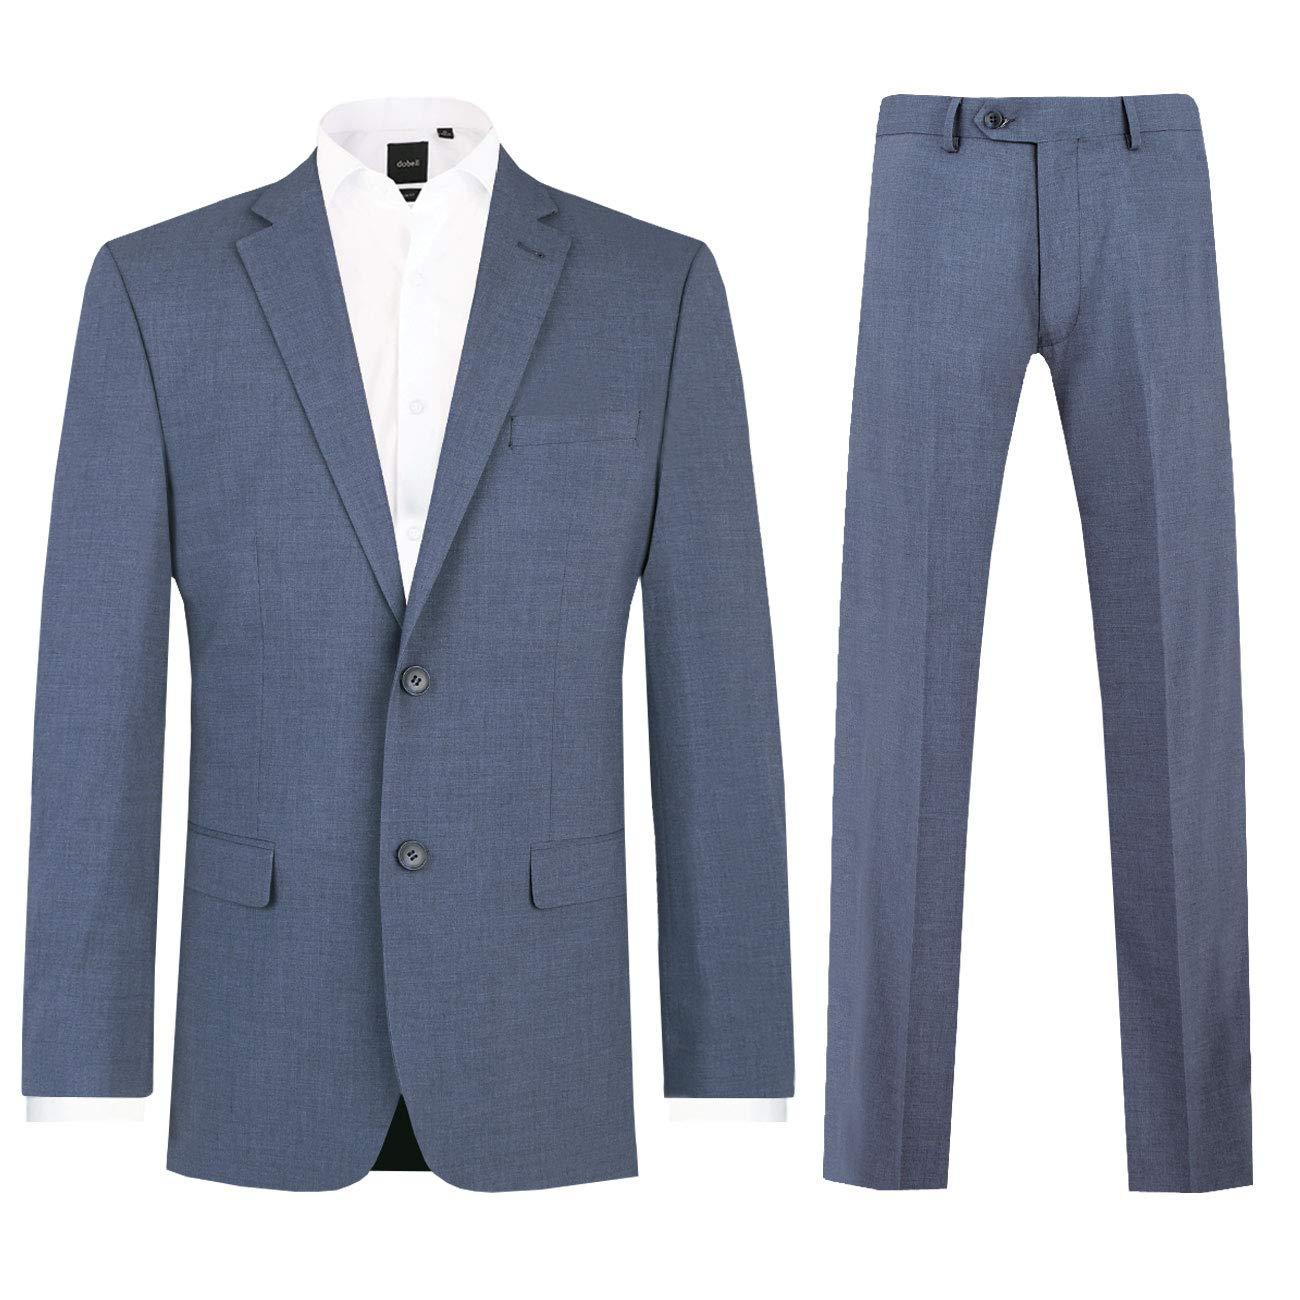 Dobell Herren Anzug Zweiteilig Orionblau Regular Fit